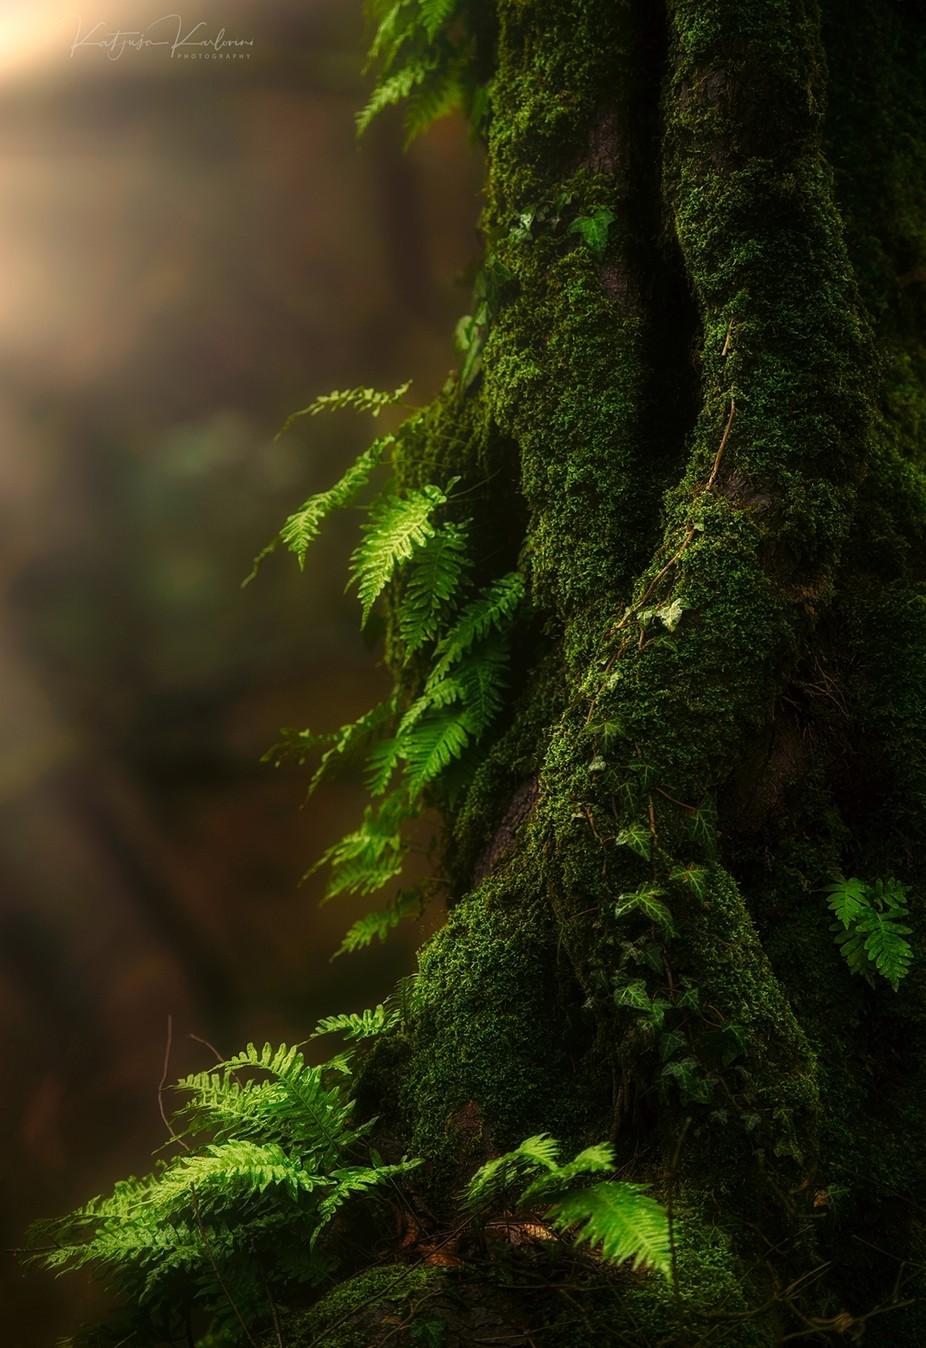 Shy by Katjusa_Karlovini - The Nature Lover Photo Contest